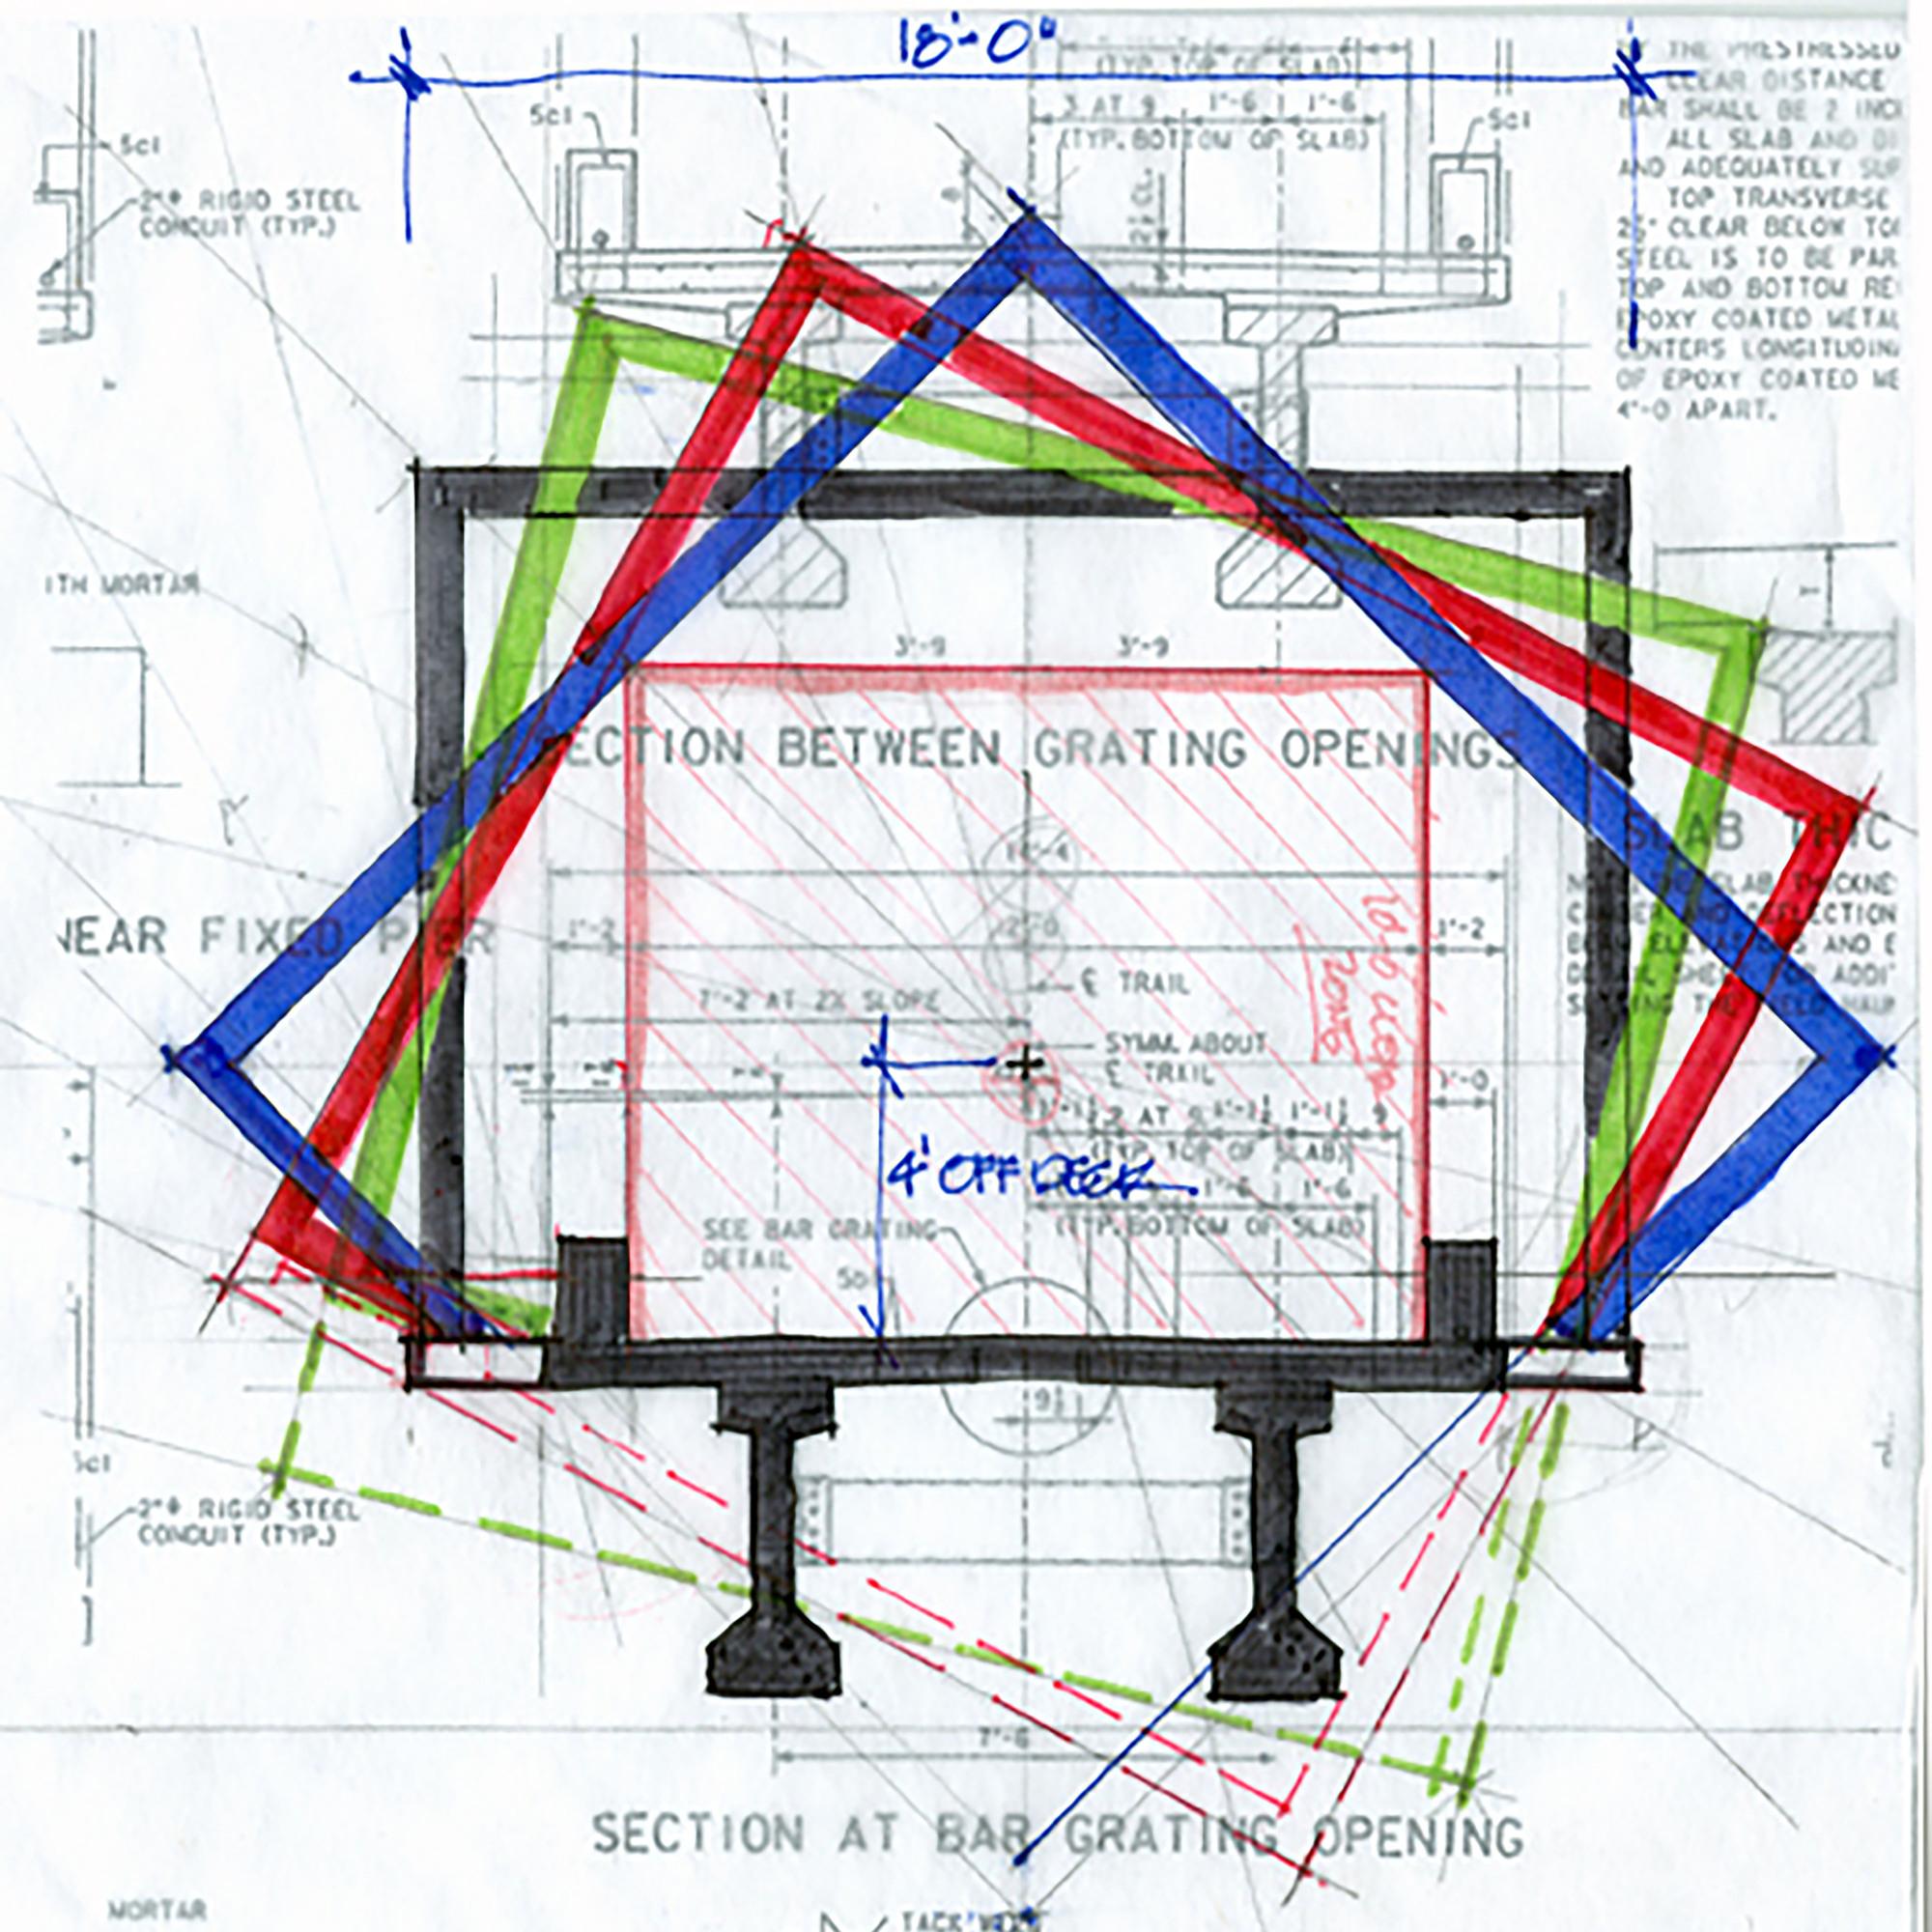 Gallery of High Trestle Trail Bridge / RDG Planning & Design - 15